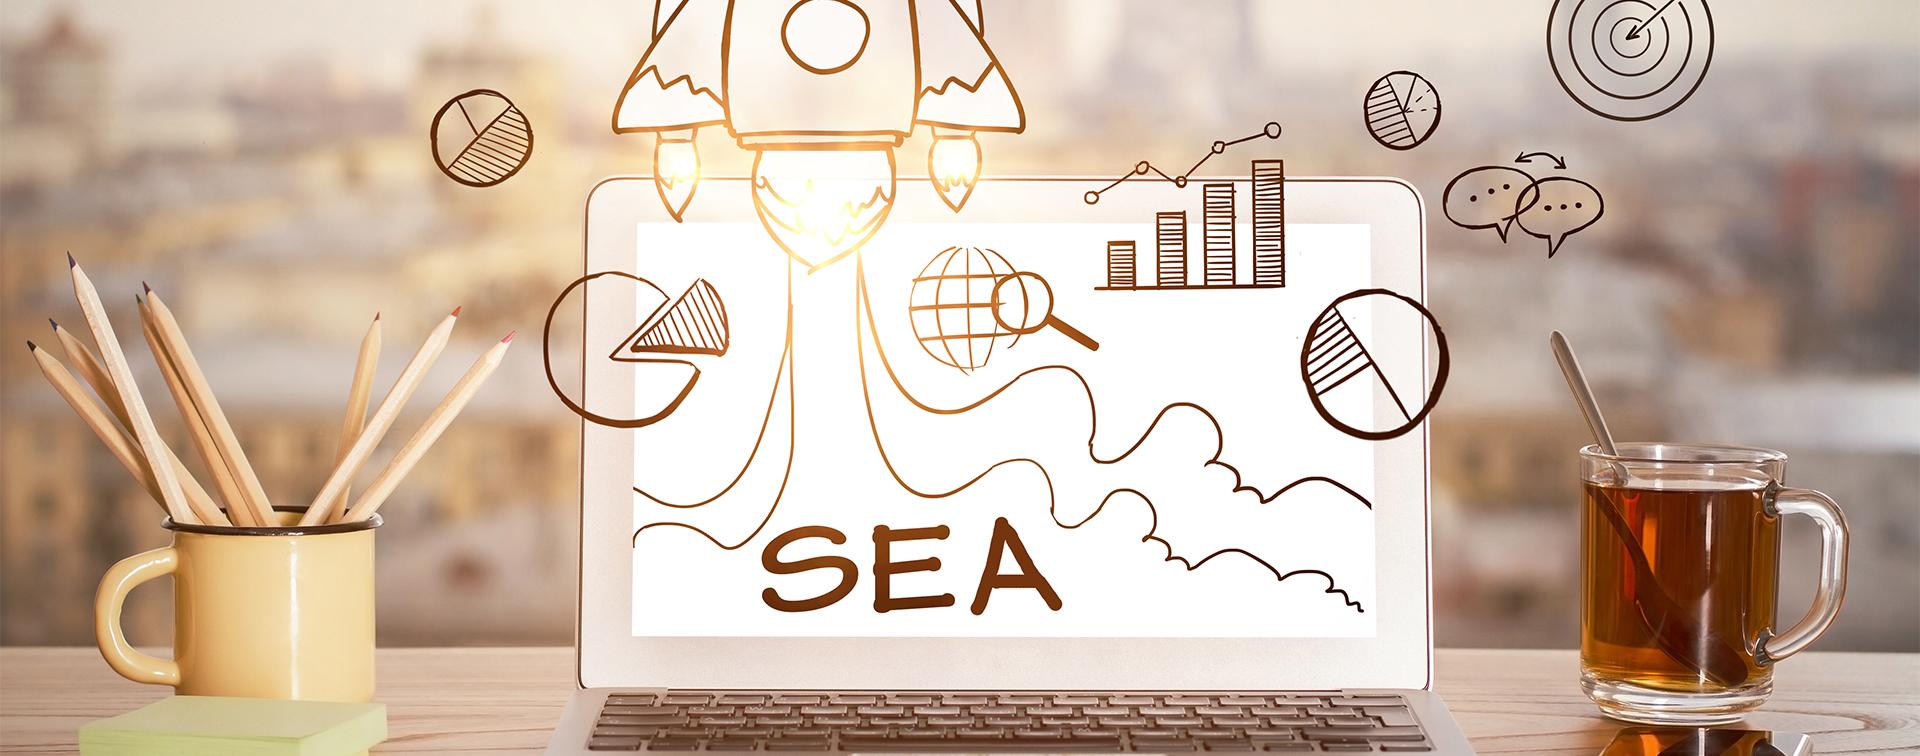 SEA, betalende referencering||Vier redenen om te opteren voor betalende referencering